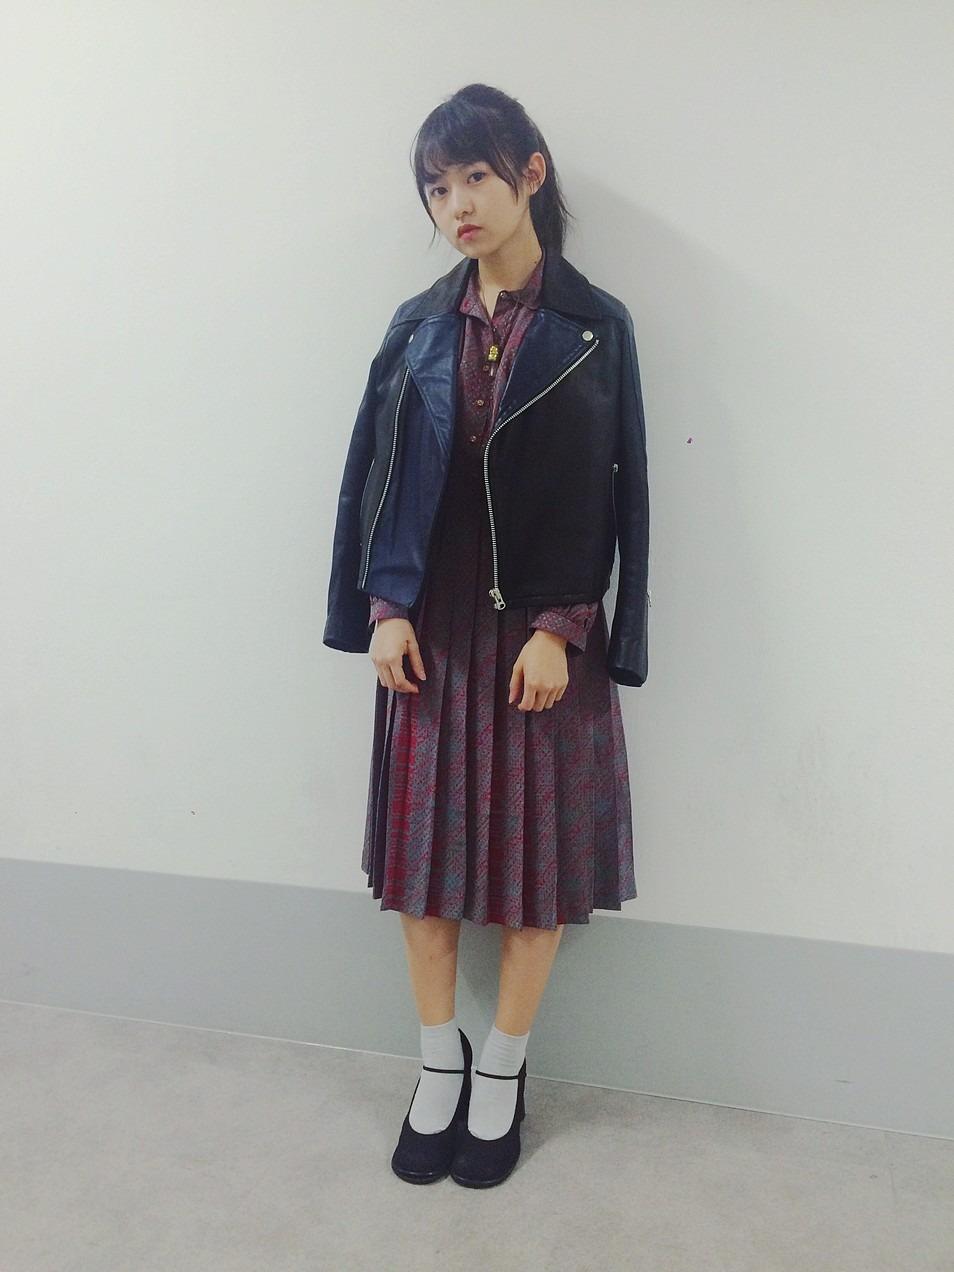 伊藤万理華の画像 p1_31